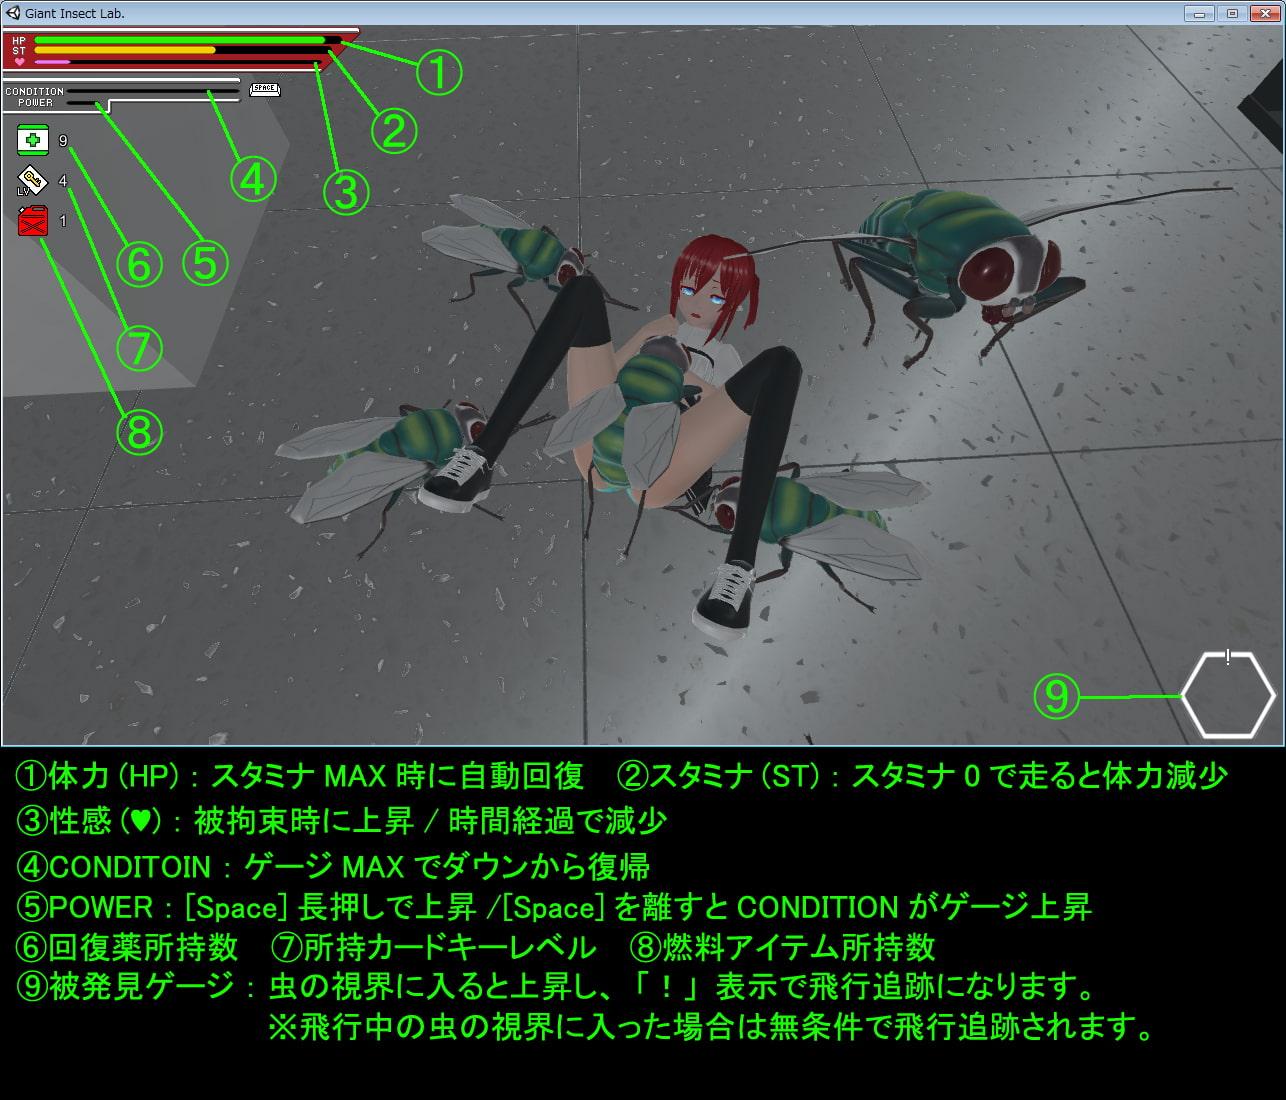 GIL~巨大昆虫研究所~ (Update Ver 1.02)